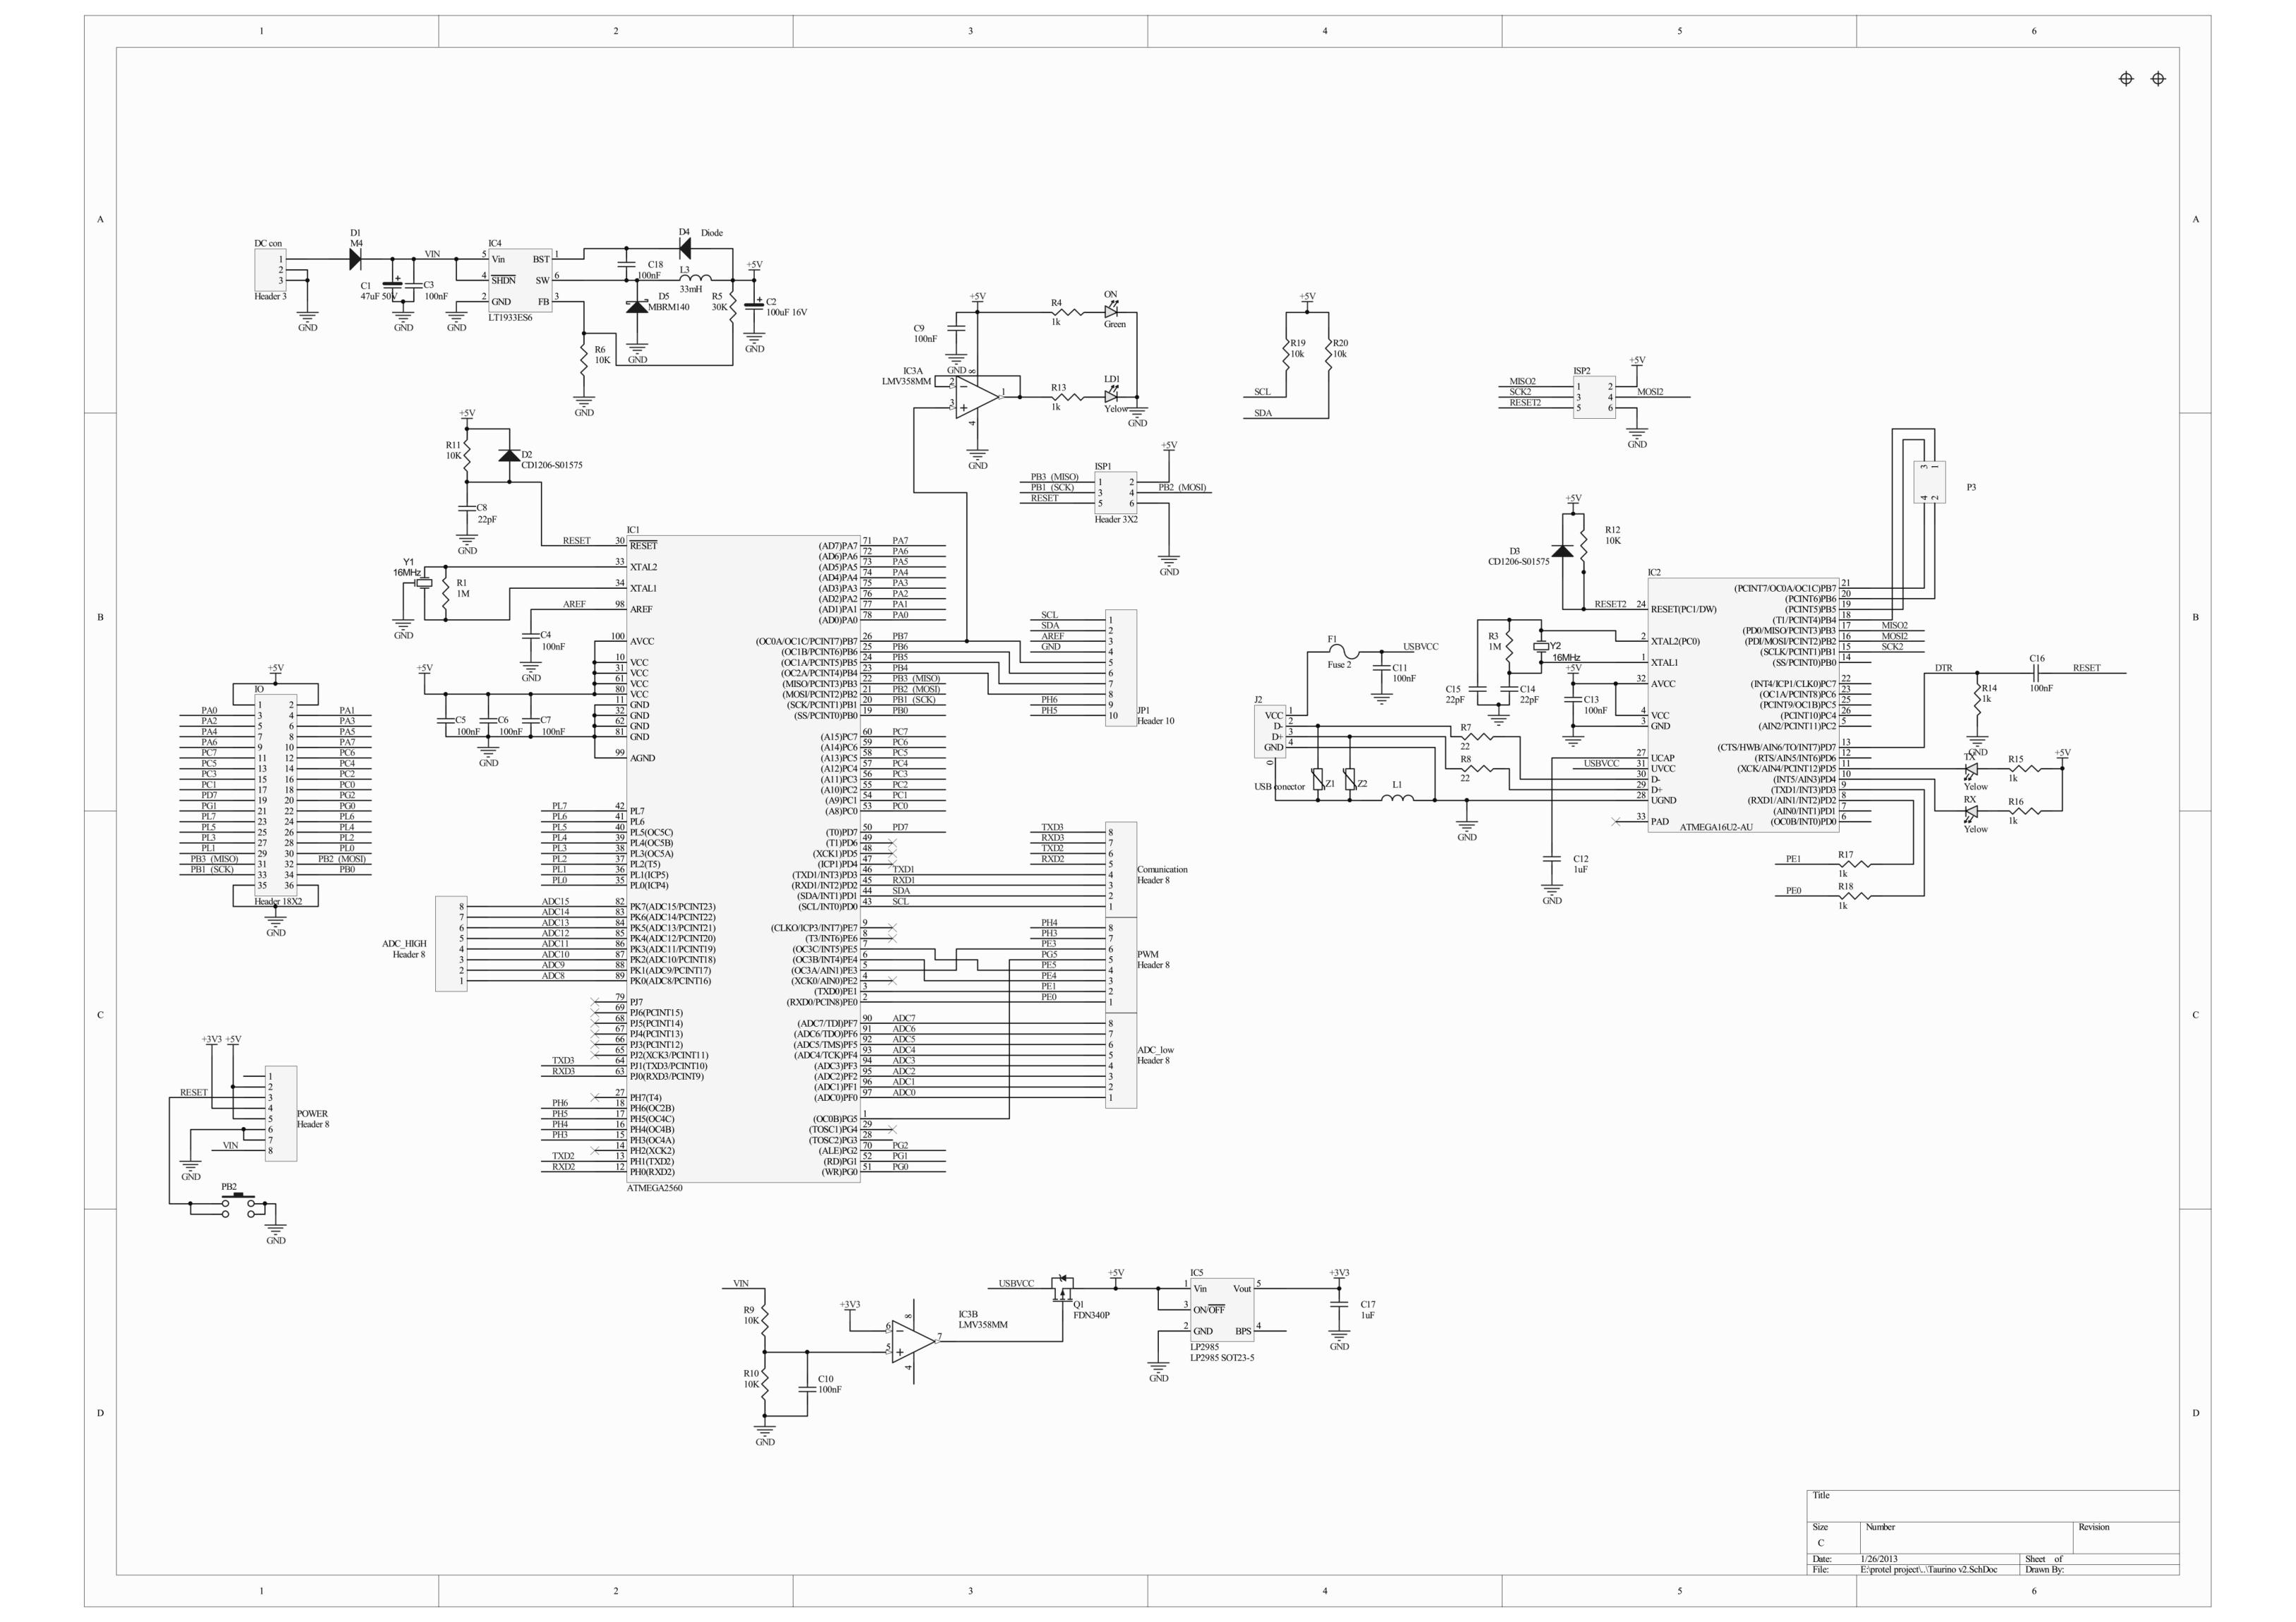 Taurino Power 24v Mega R3